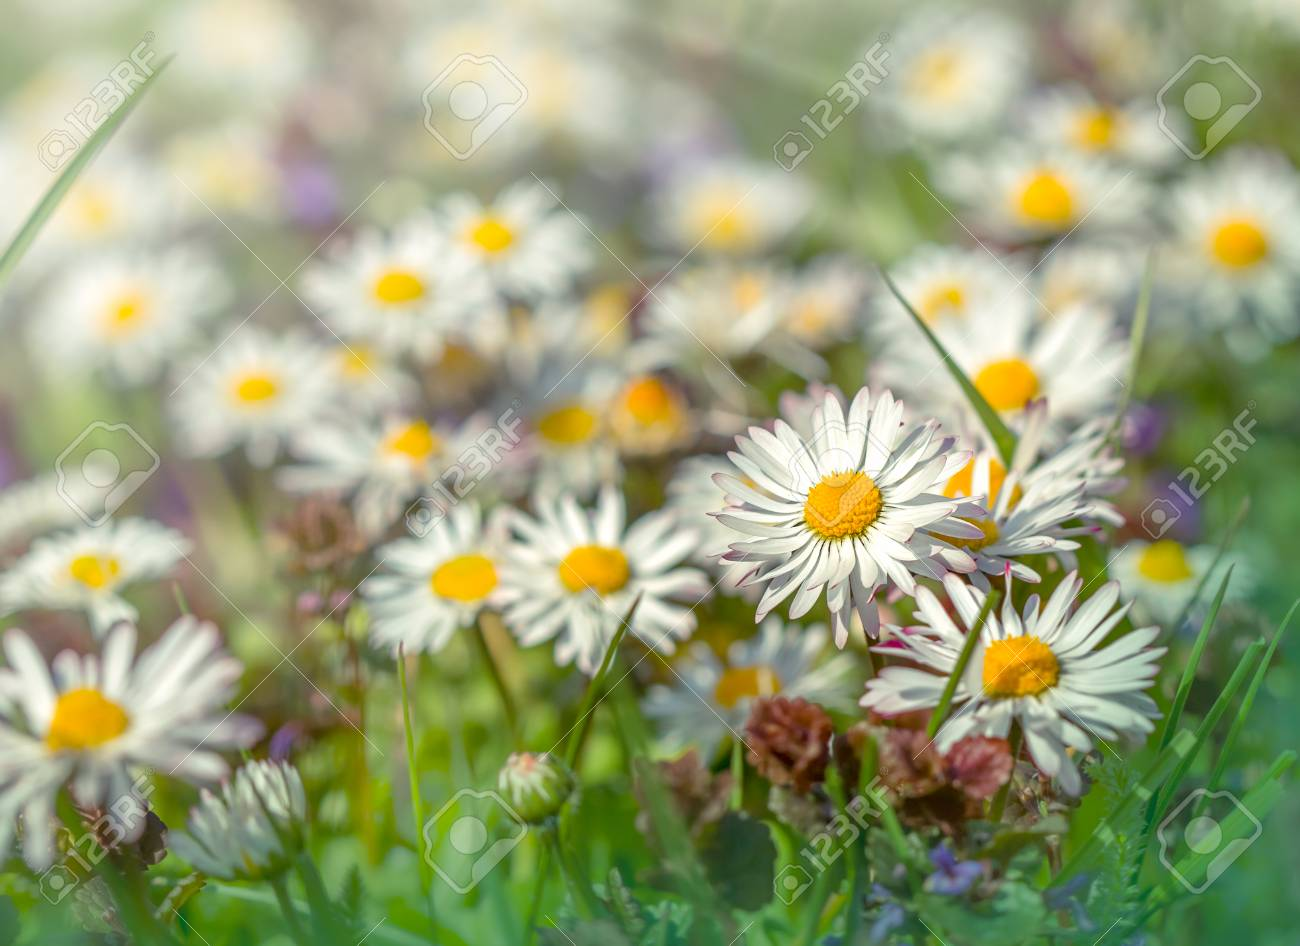 Beautiful daisy flowers in meadow springtime stock photo picture beautiful daisy flowers in meadow springtime stock photo 54281739 izmirmasajfo